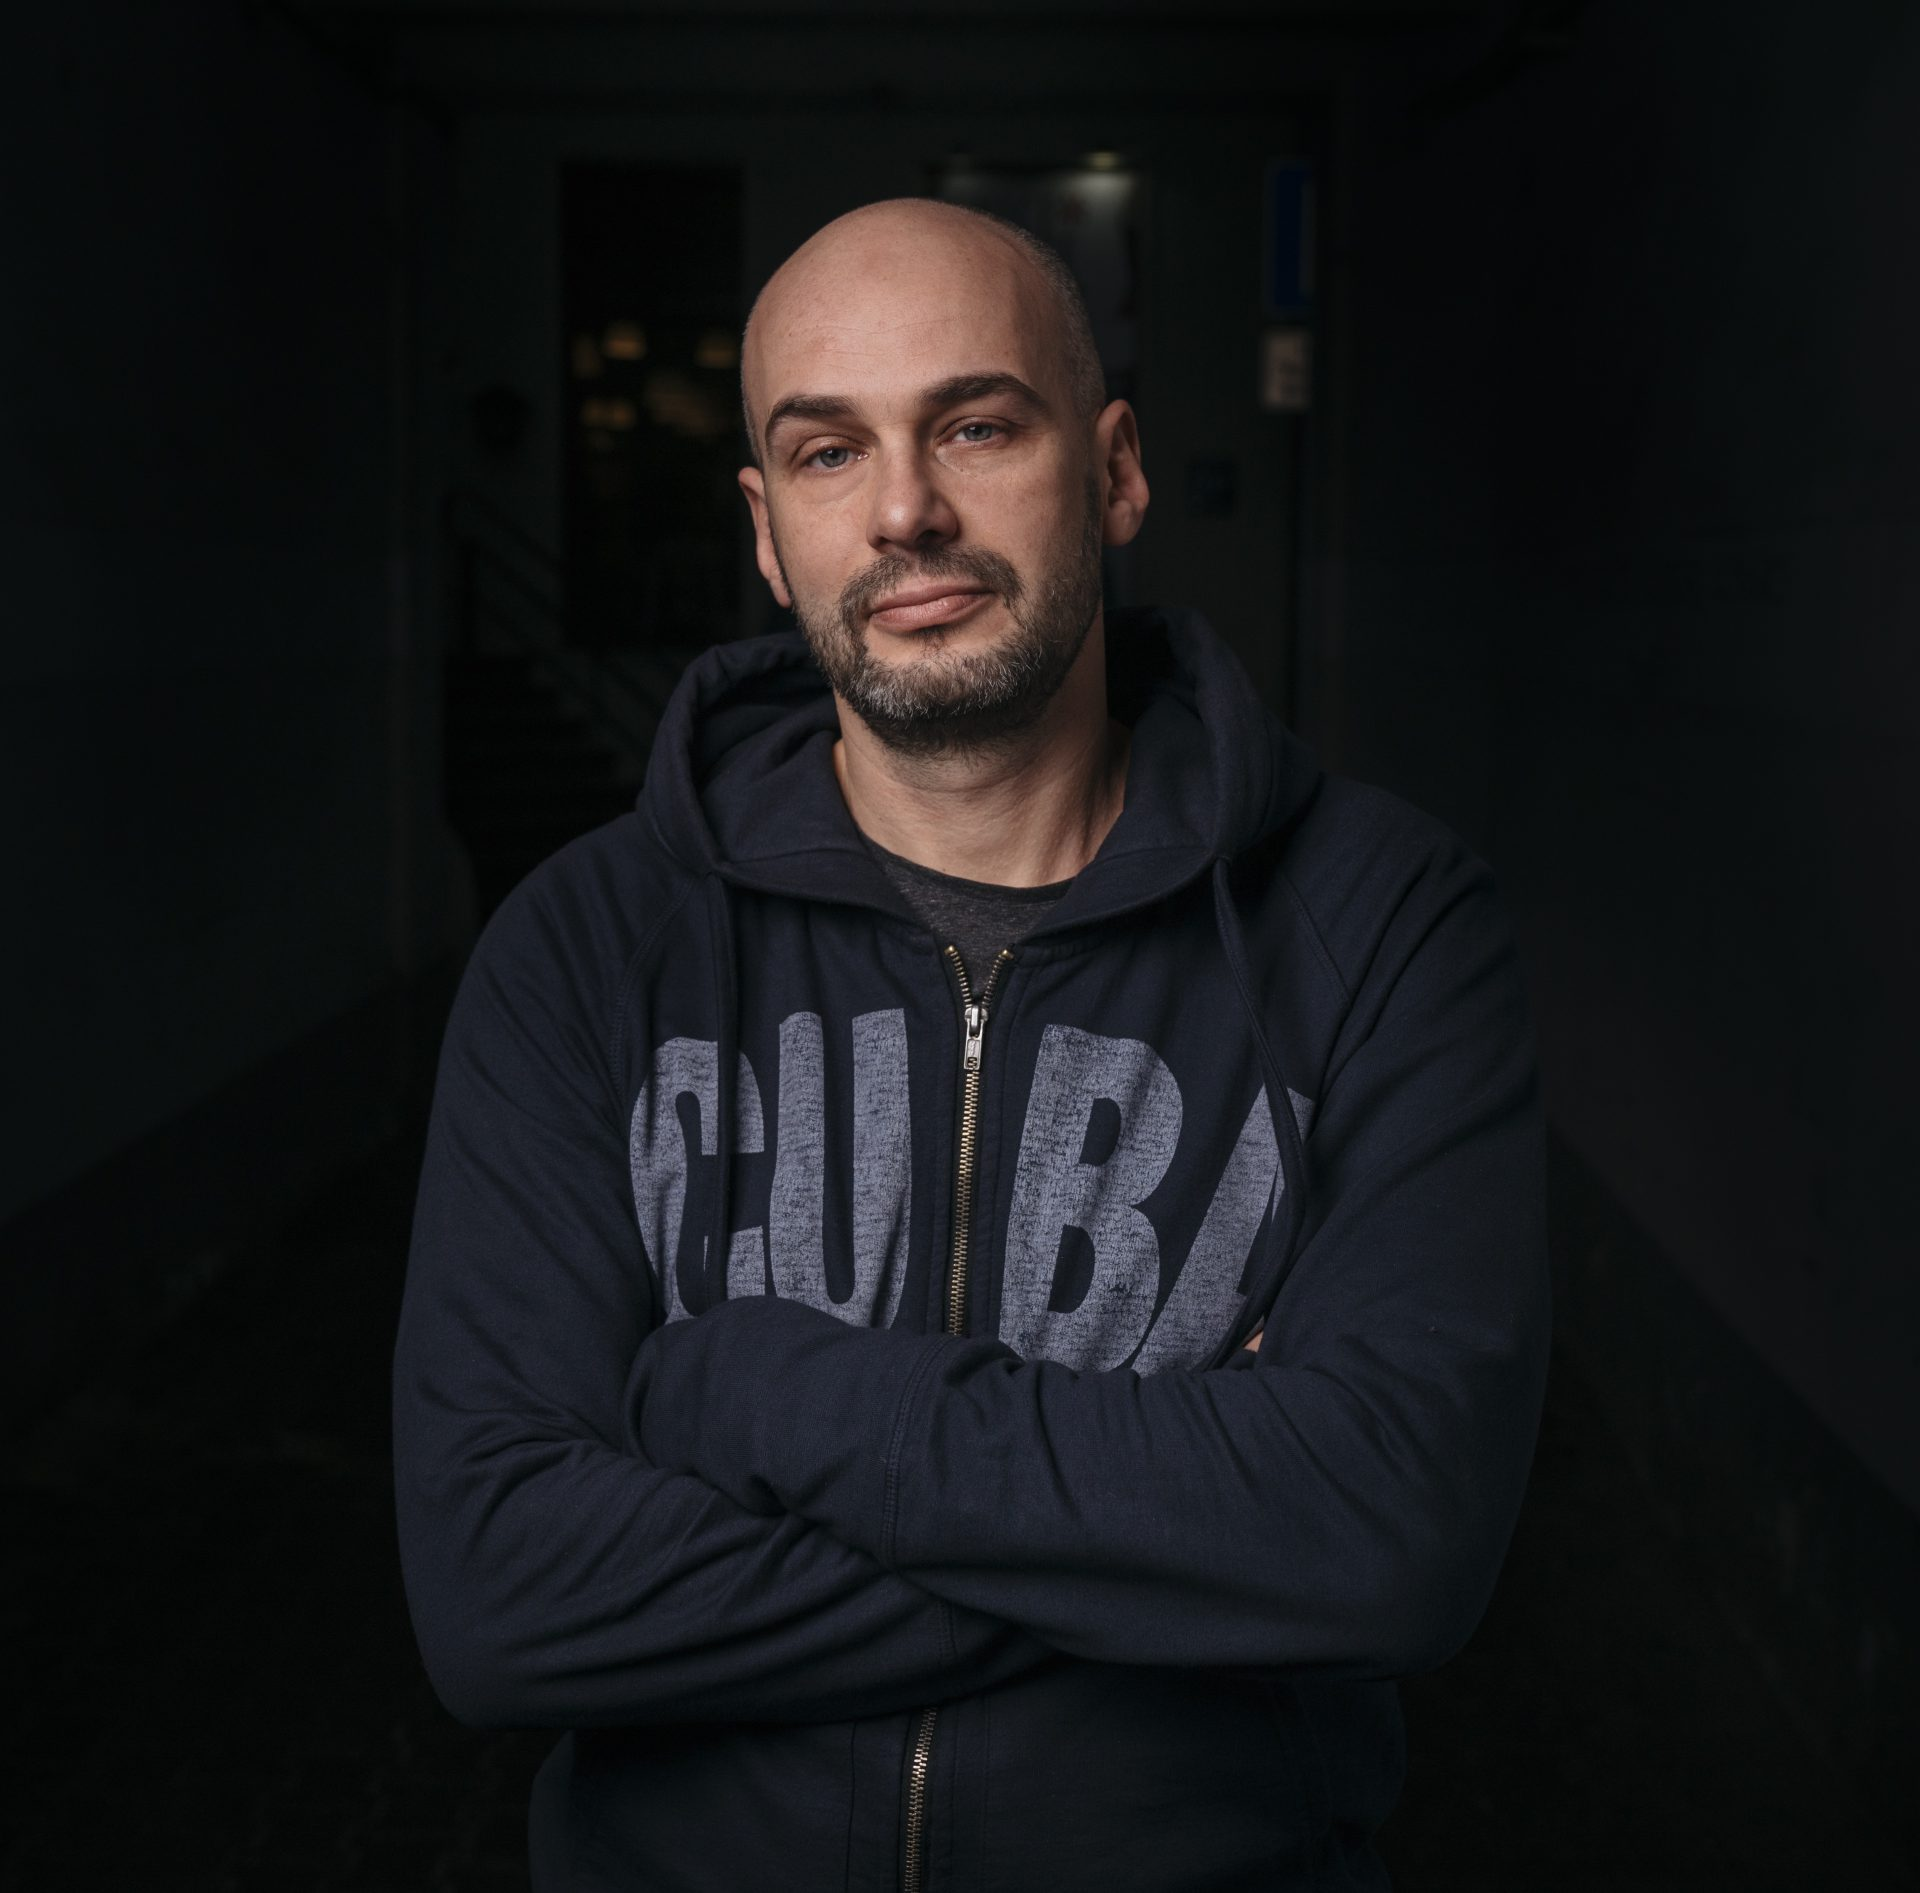 Siergiej Timofiejew (fot.Toms Harjo)